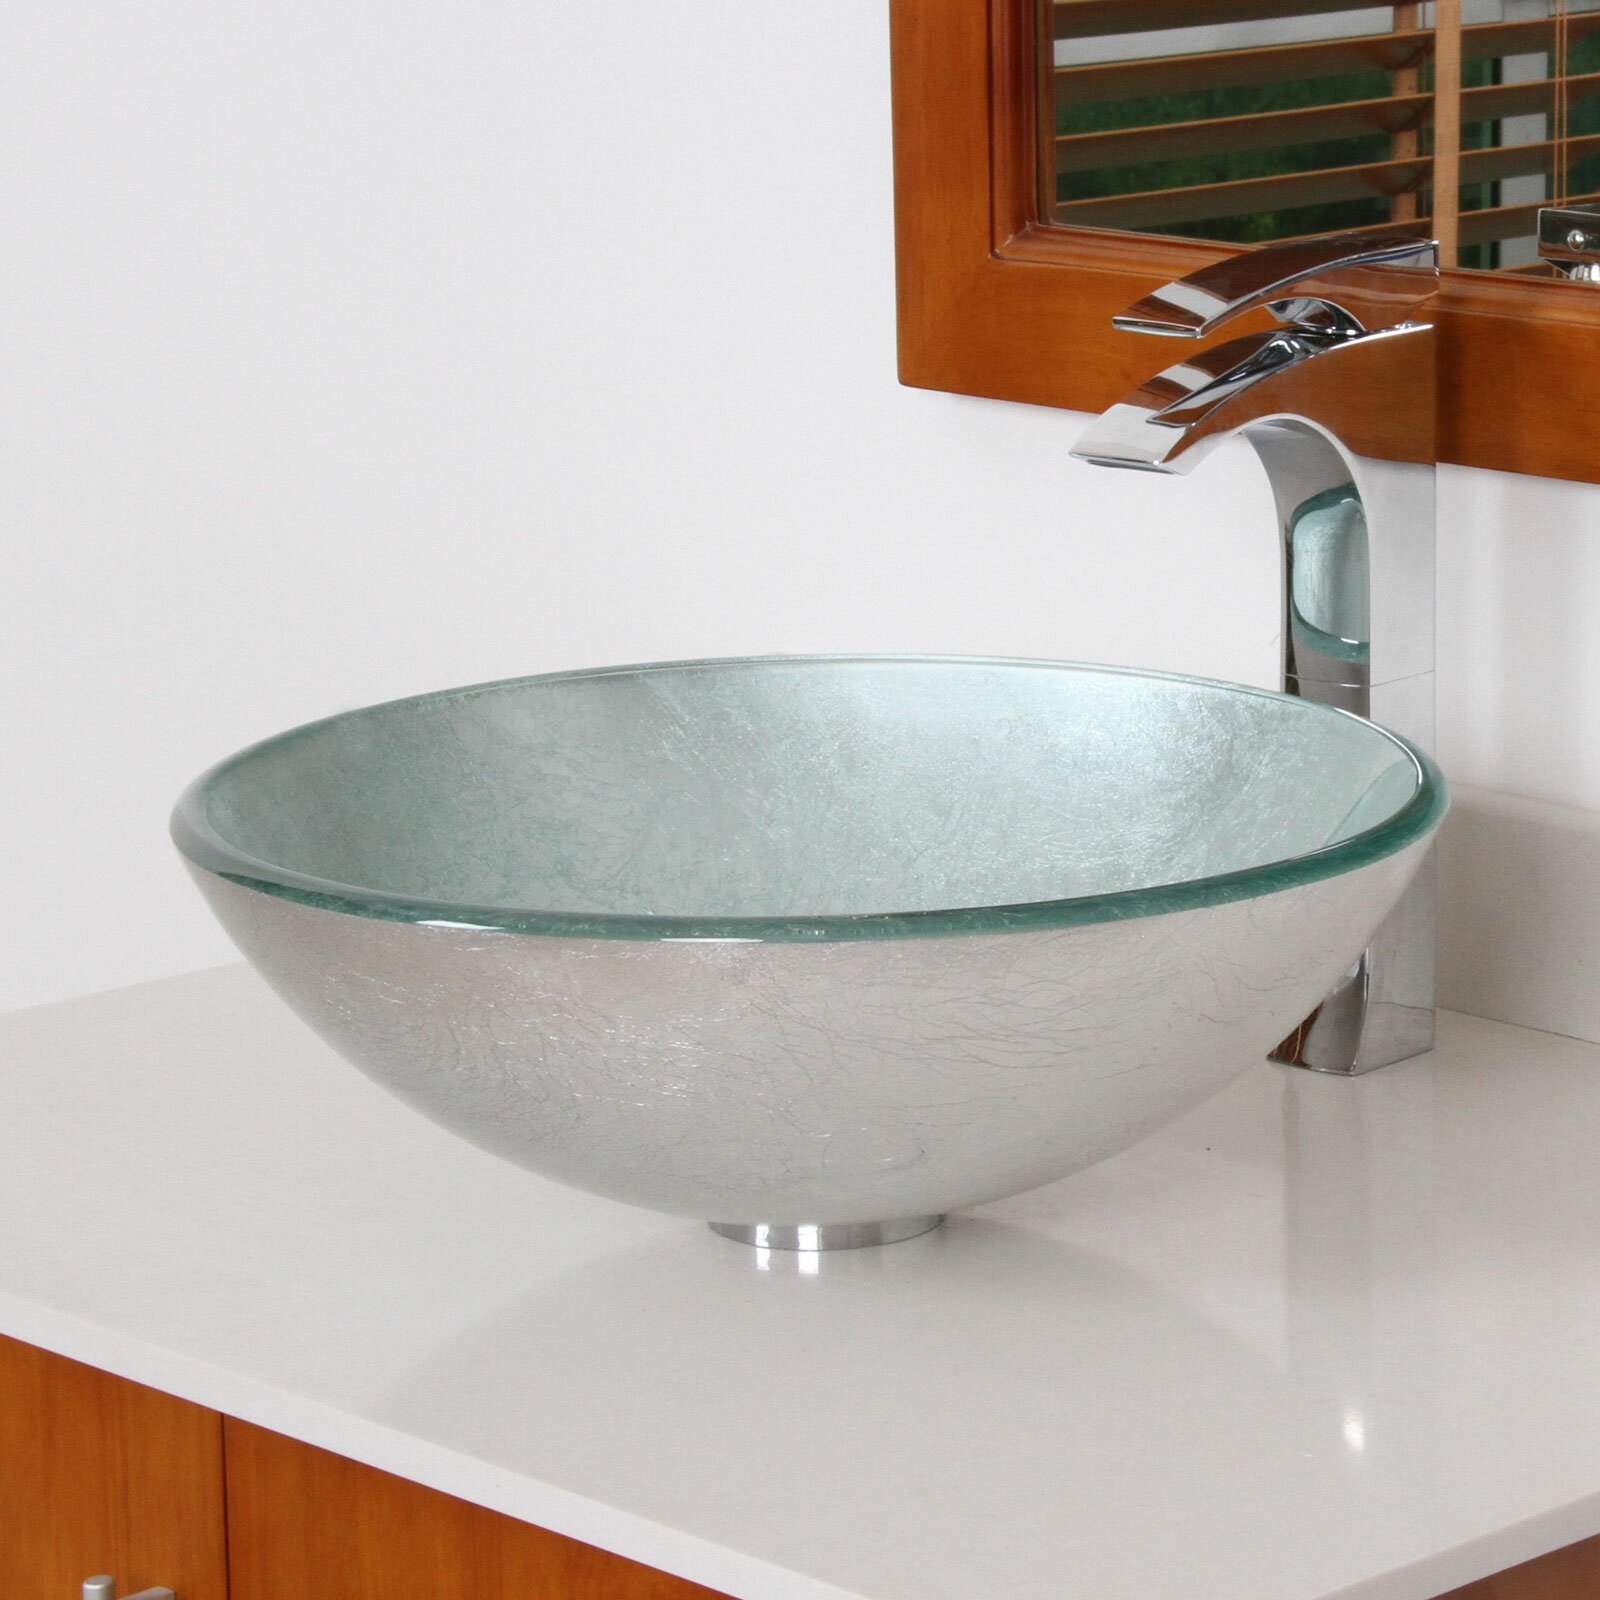 elite hand painted foil round bowl vessel bathroom sink & reviews